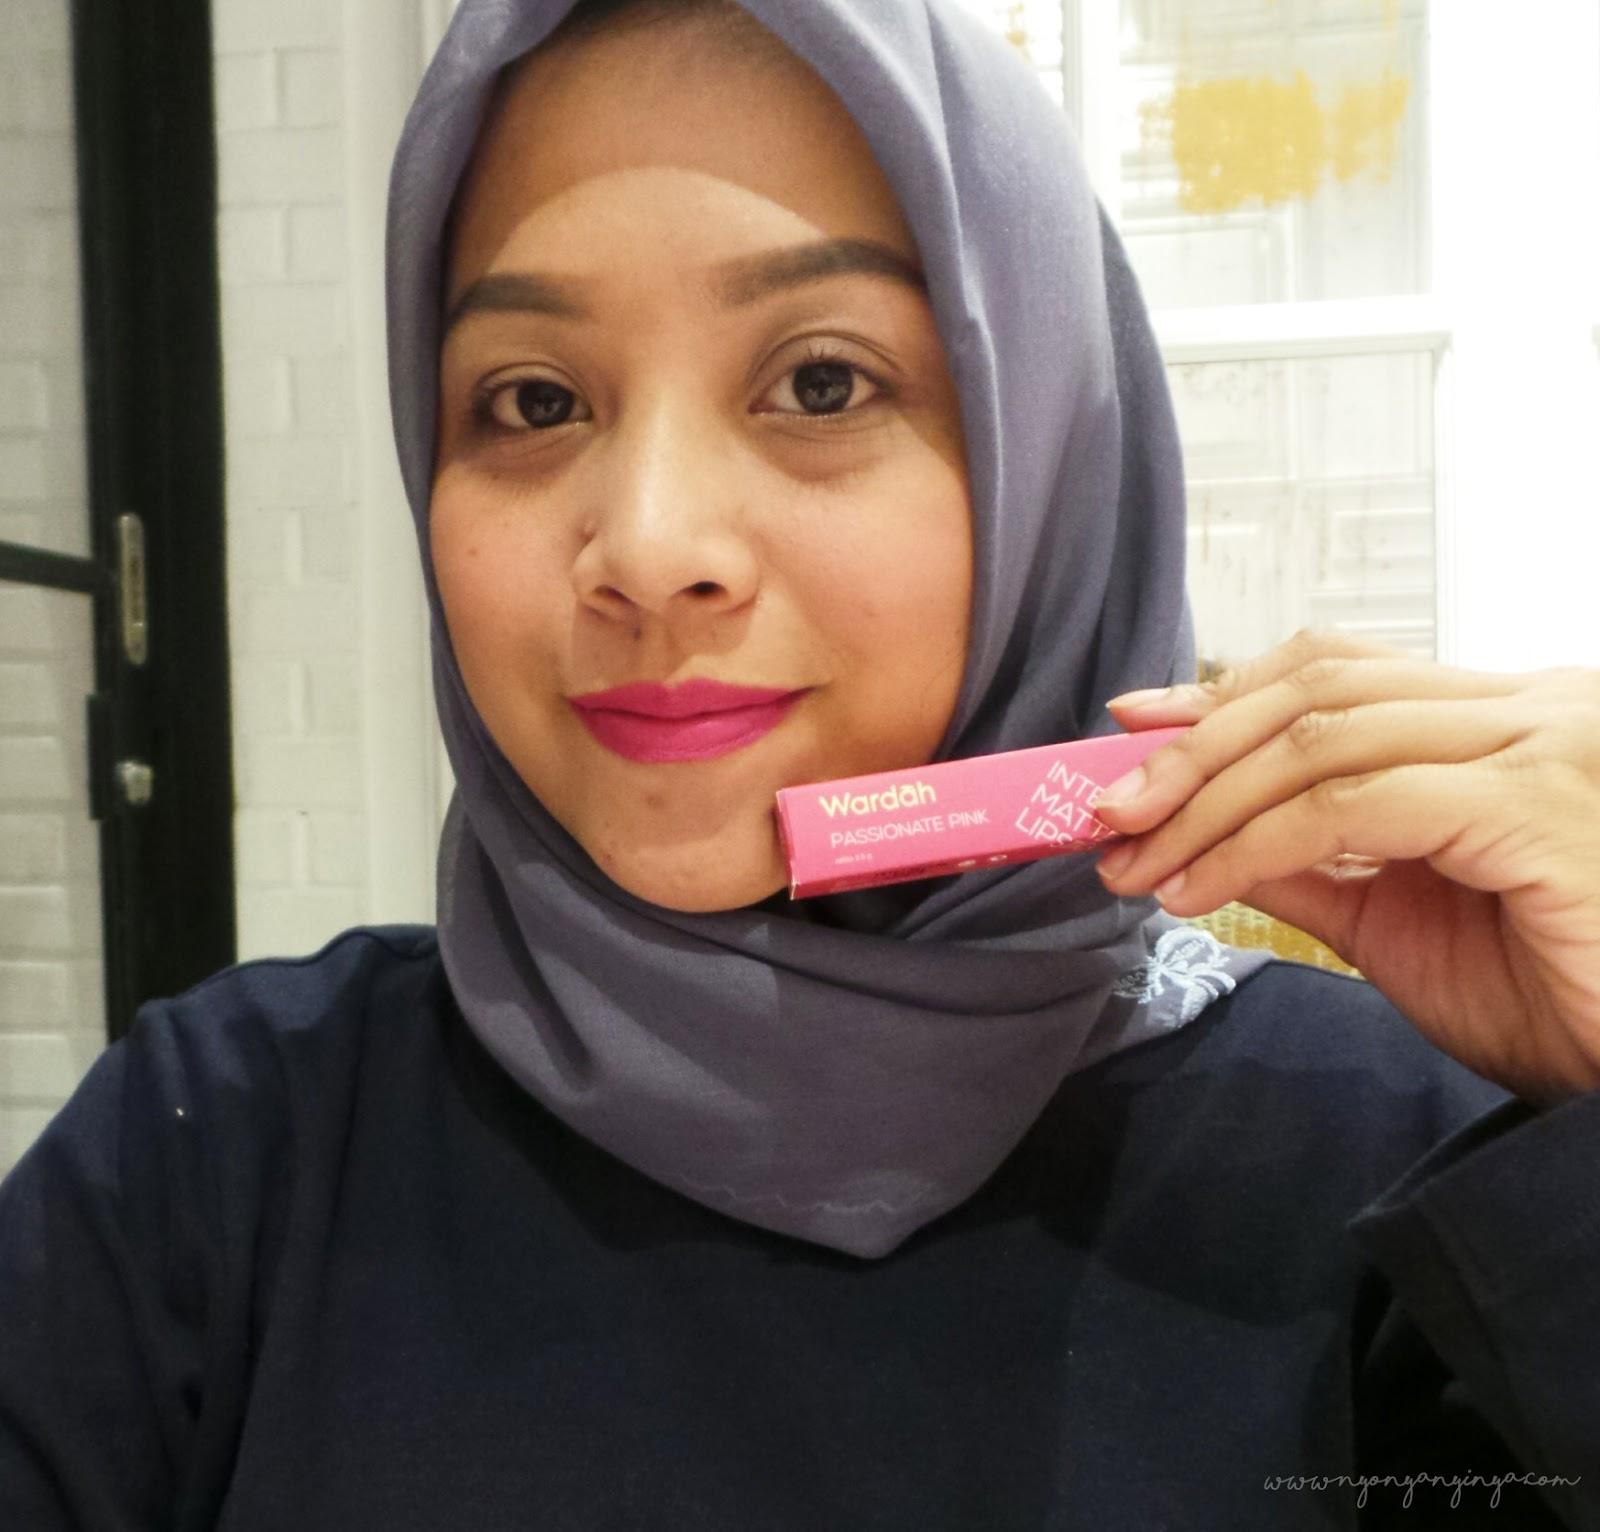 Nyonya Nyinyas Room Review And Swatch Wardah Intense Matte Lipstick Lipstik No9 07 Passionate Pink